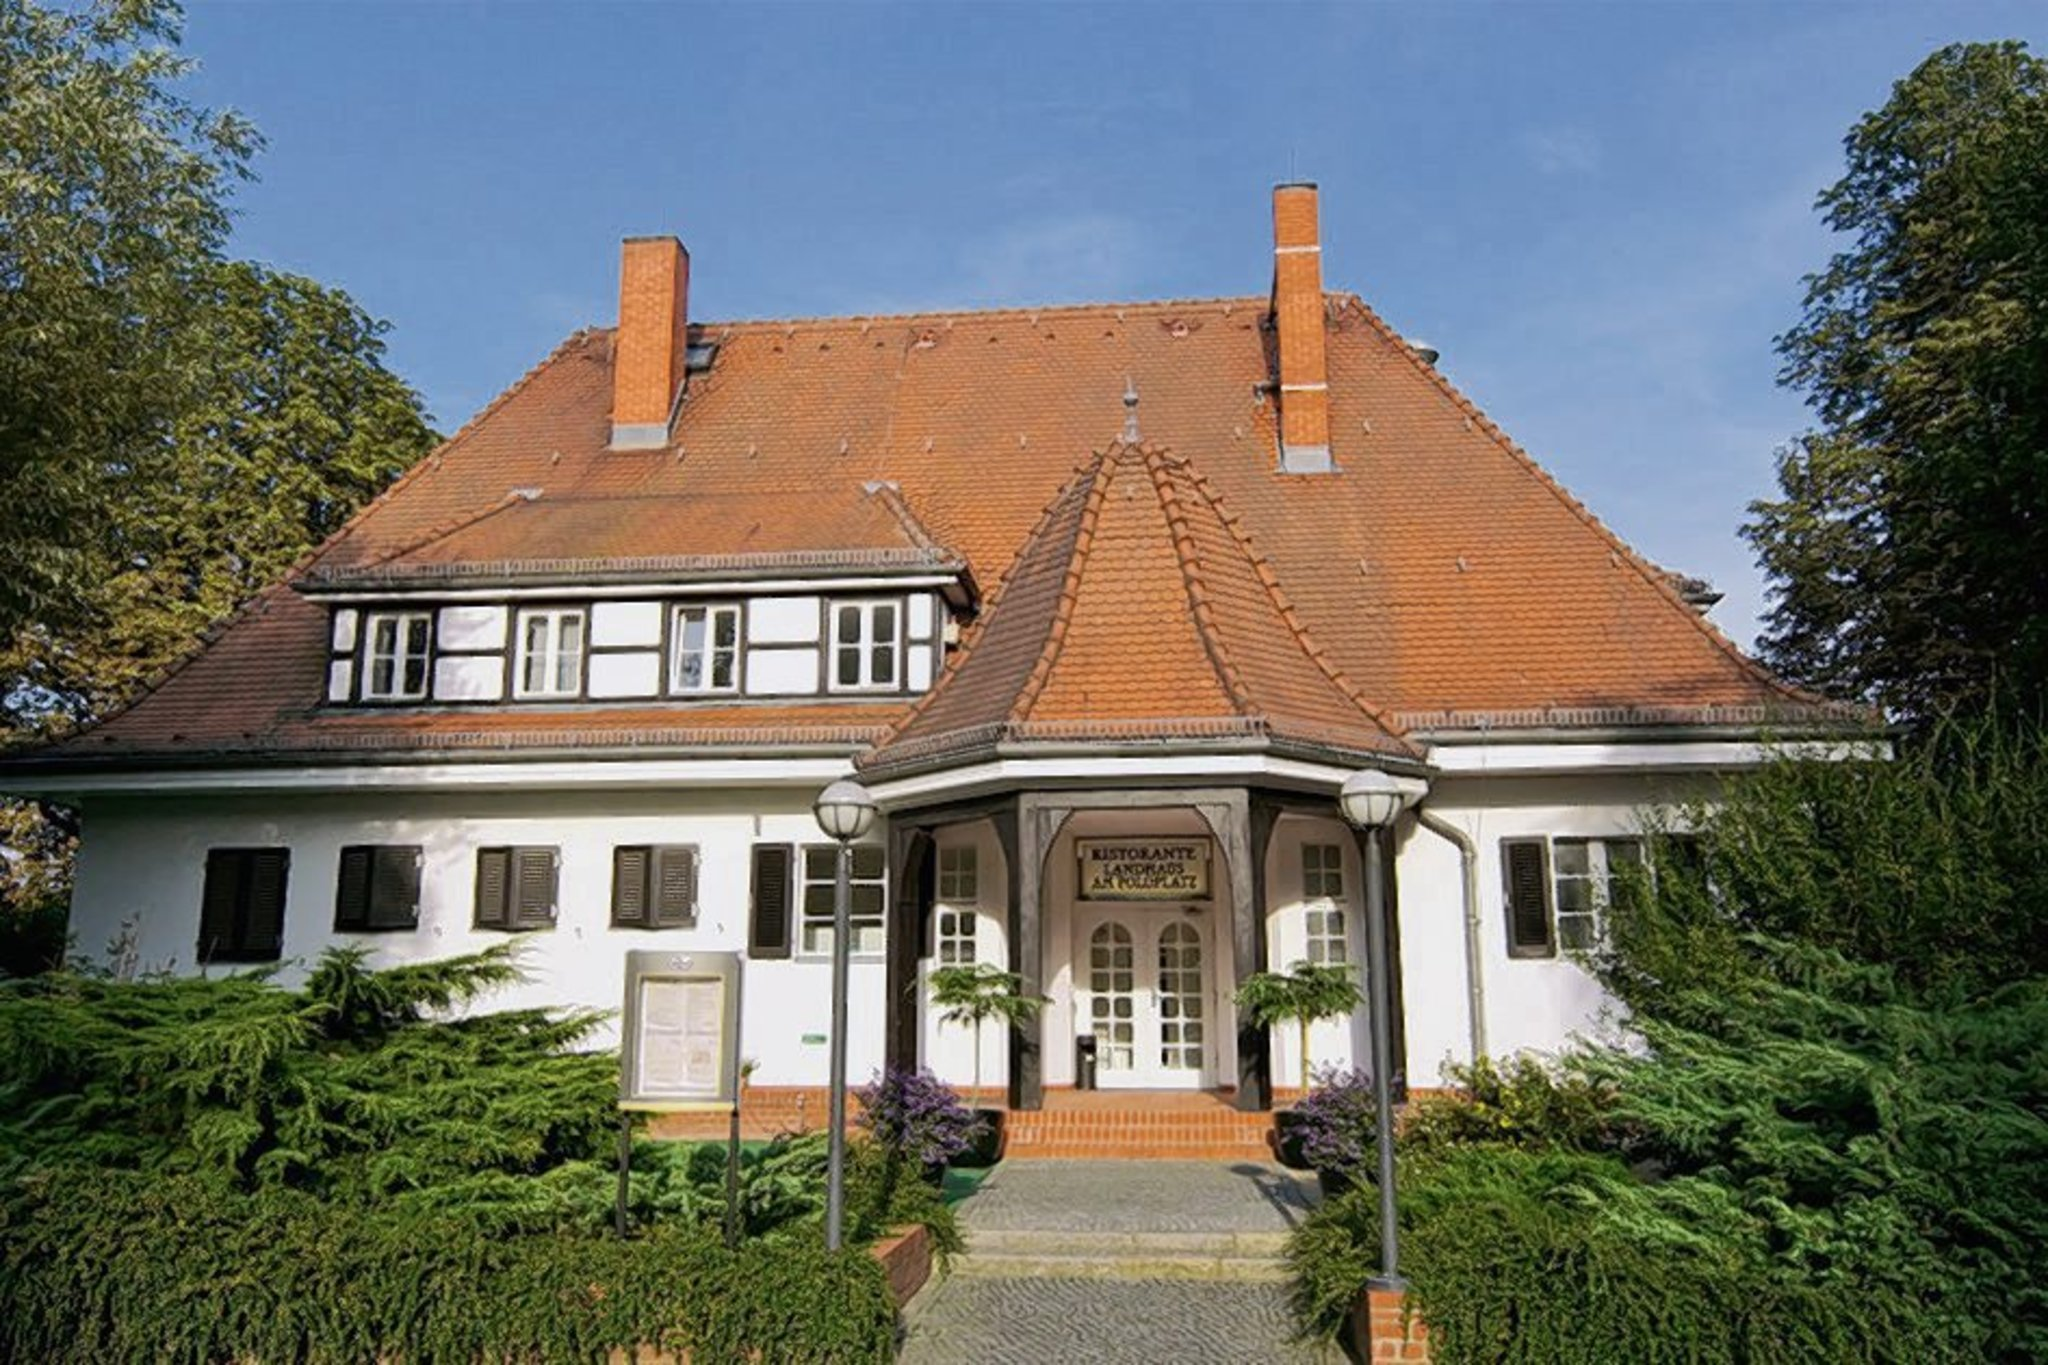 endlich fr hling ab ins landhaus am poloplatz frohnau. Black Bedroom Furniture Sets. Home Design Ideas